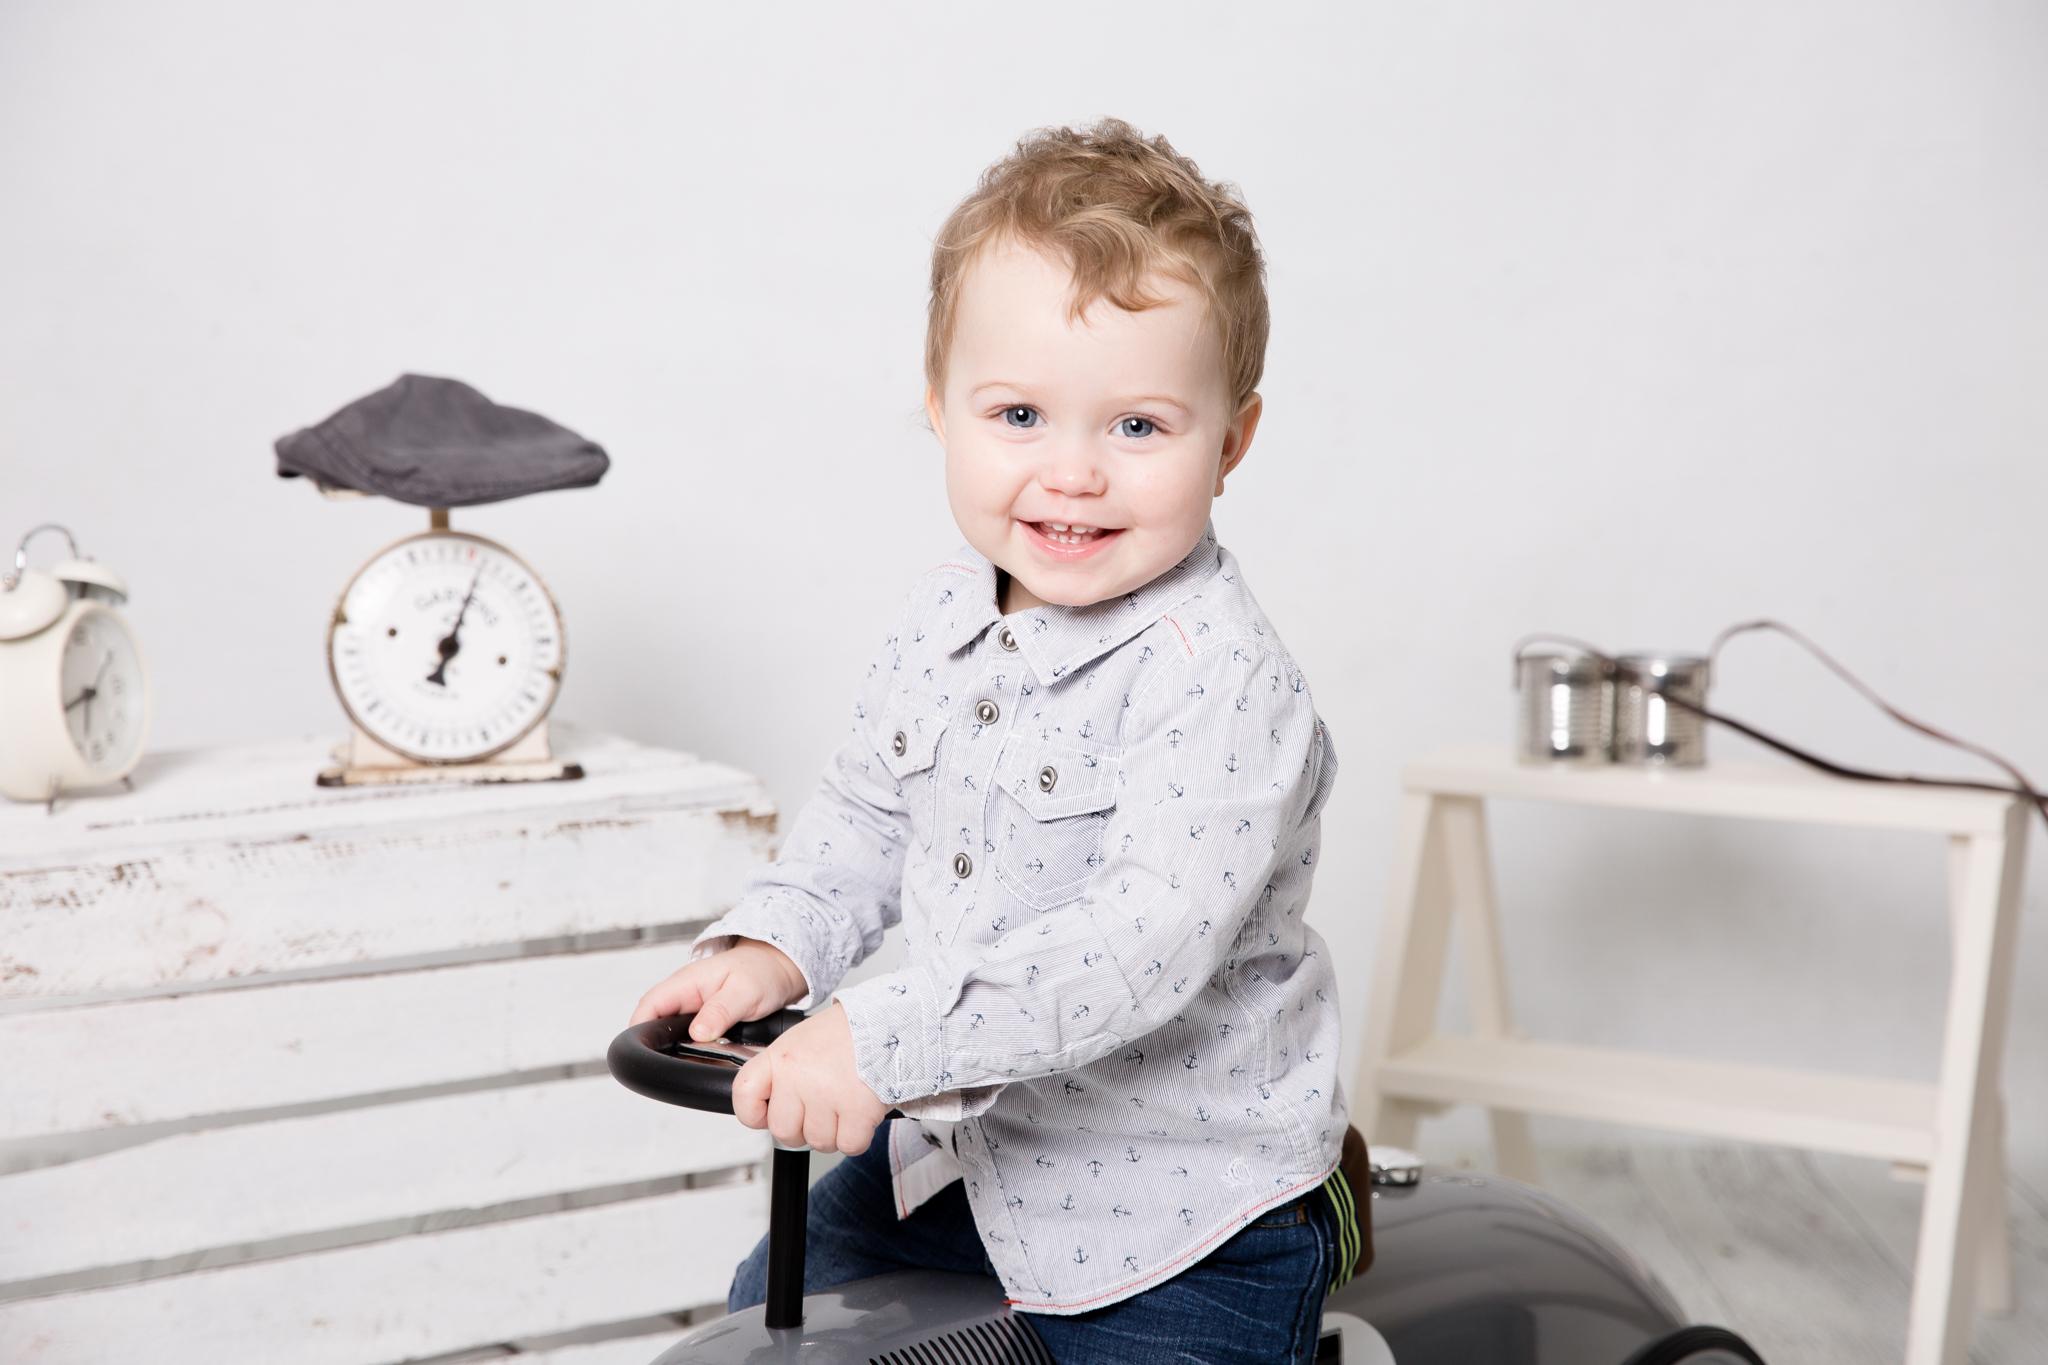 Kitafotos, Kindergartenfotos, Krippe, Kinderfotografie, Hamburg, Geesthacht, Reinbek, Glinde